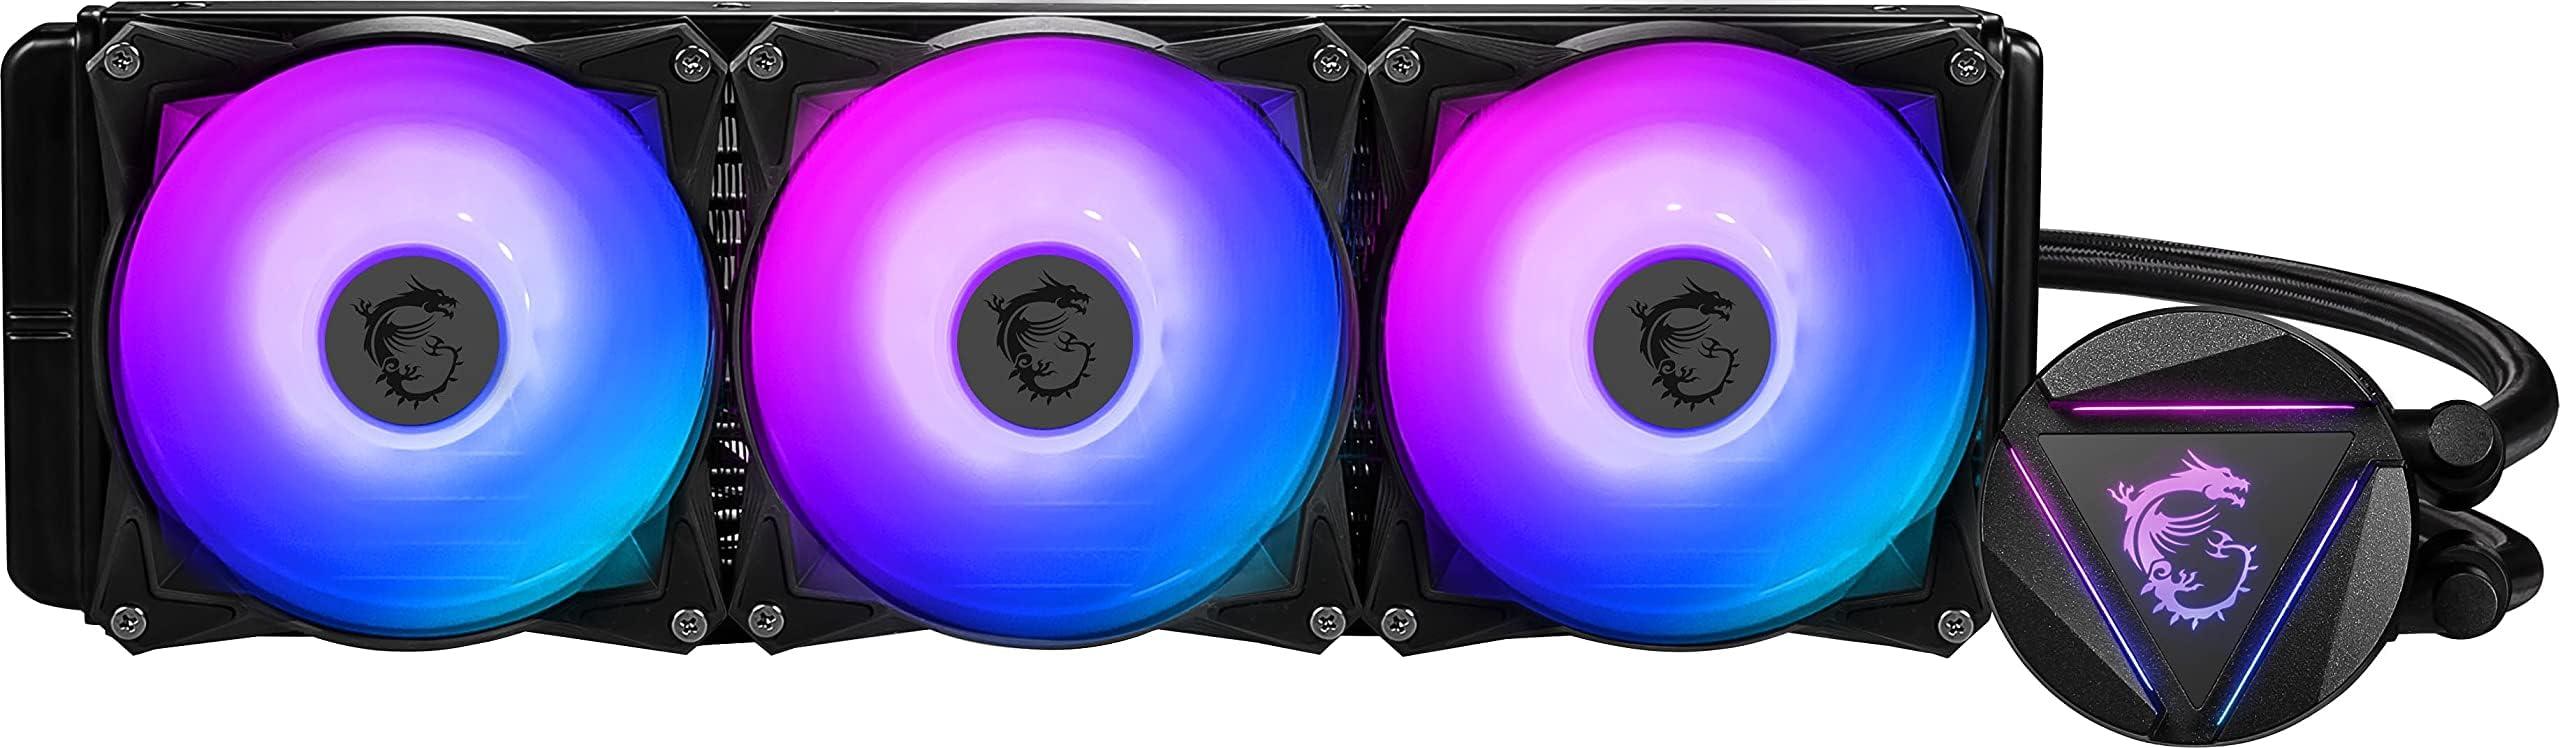 MSI MAG Series RGB CPU Liquid Cooler (AIO): Rotatable Blockhead Design, 360mm Radiator, Triple 120mm RGB PWM Fans, MAG CORELIQUID 360R